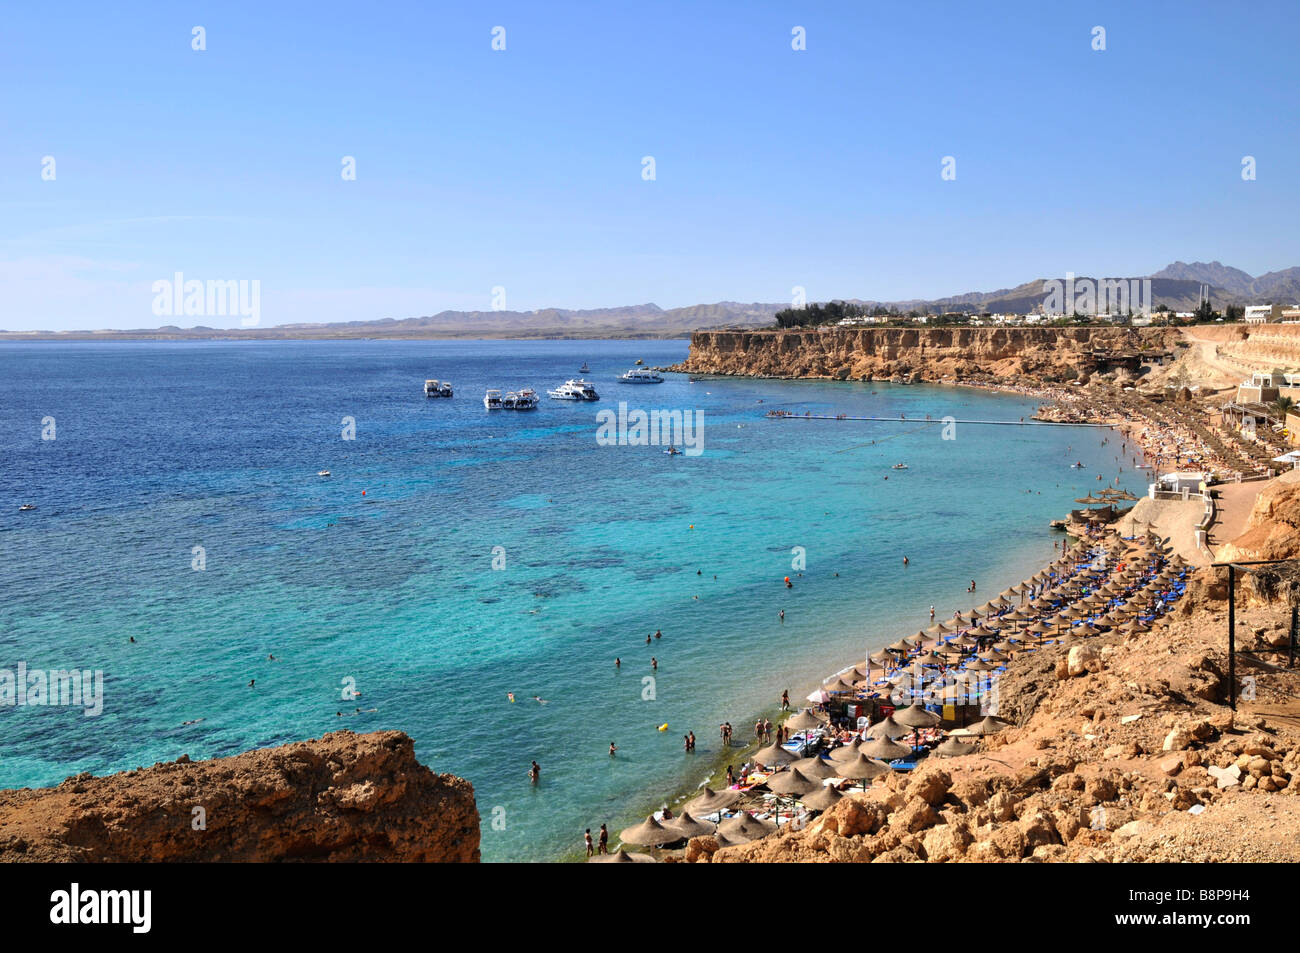 Naama bay sharm el sheikh